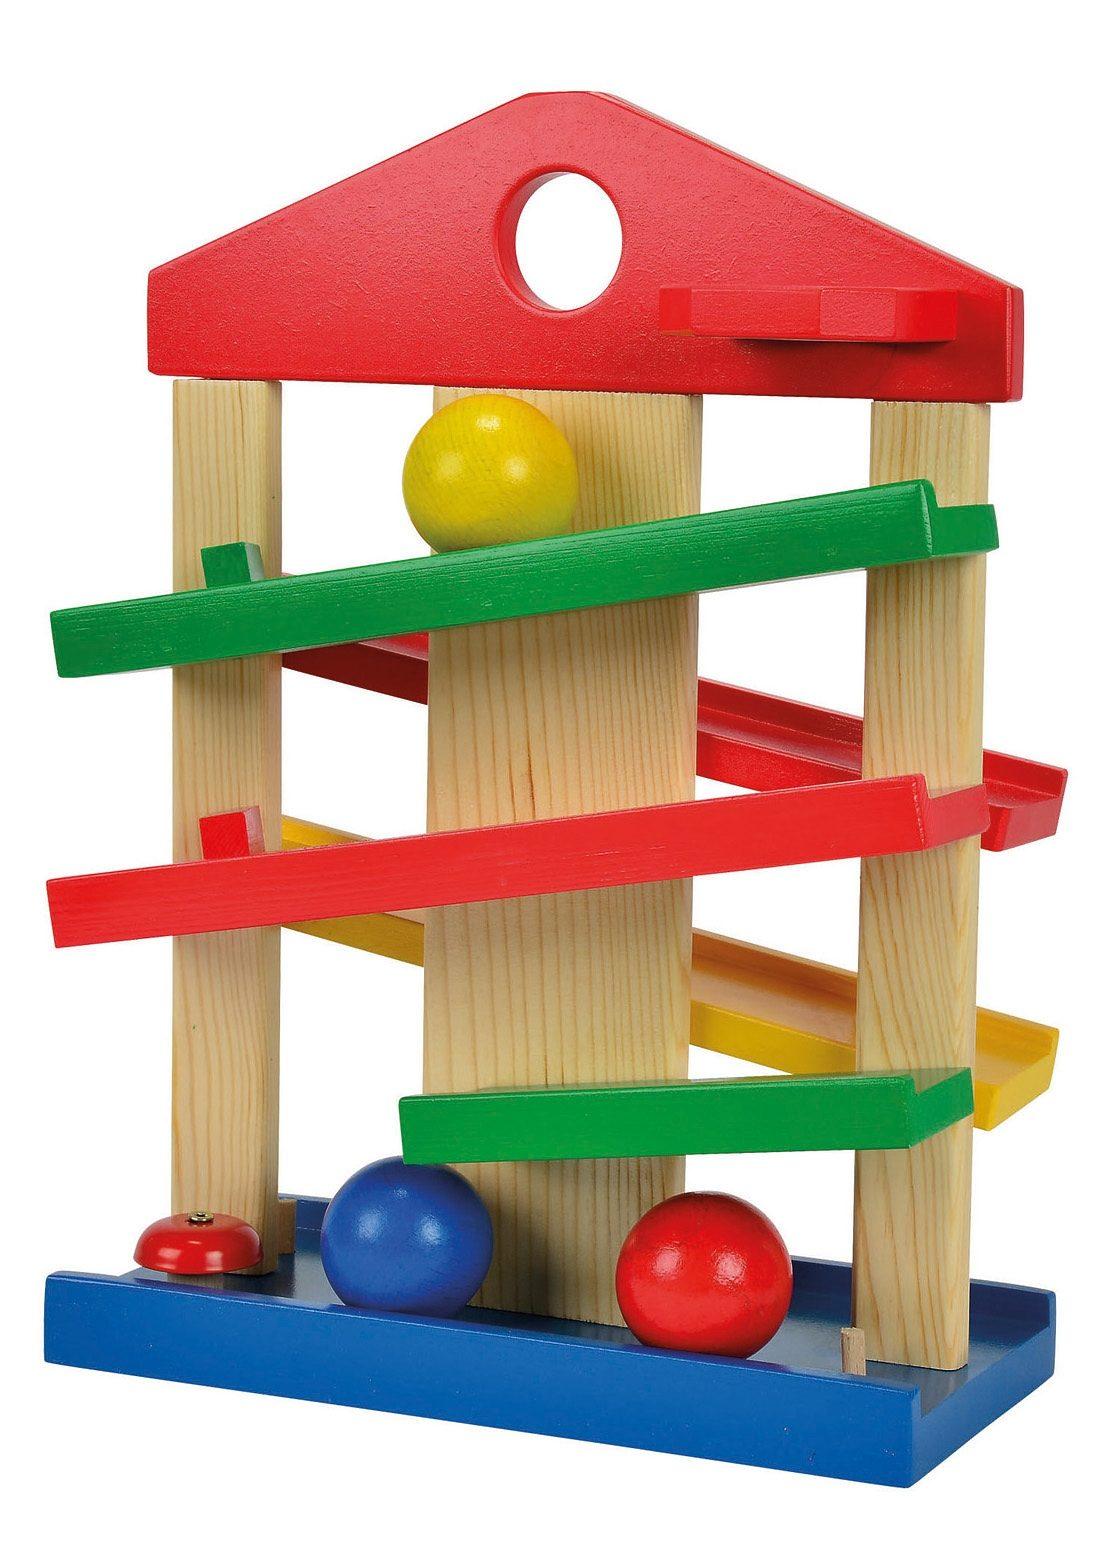 Eichhorn Kugelbahn Kugelbahn, Made in Europe bunt Kinder Holzspielzeug